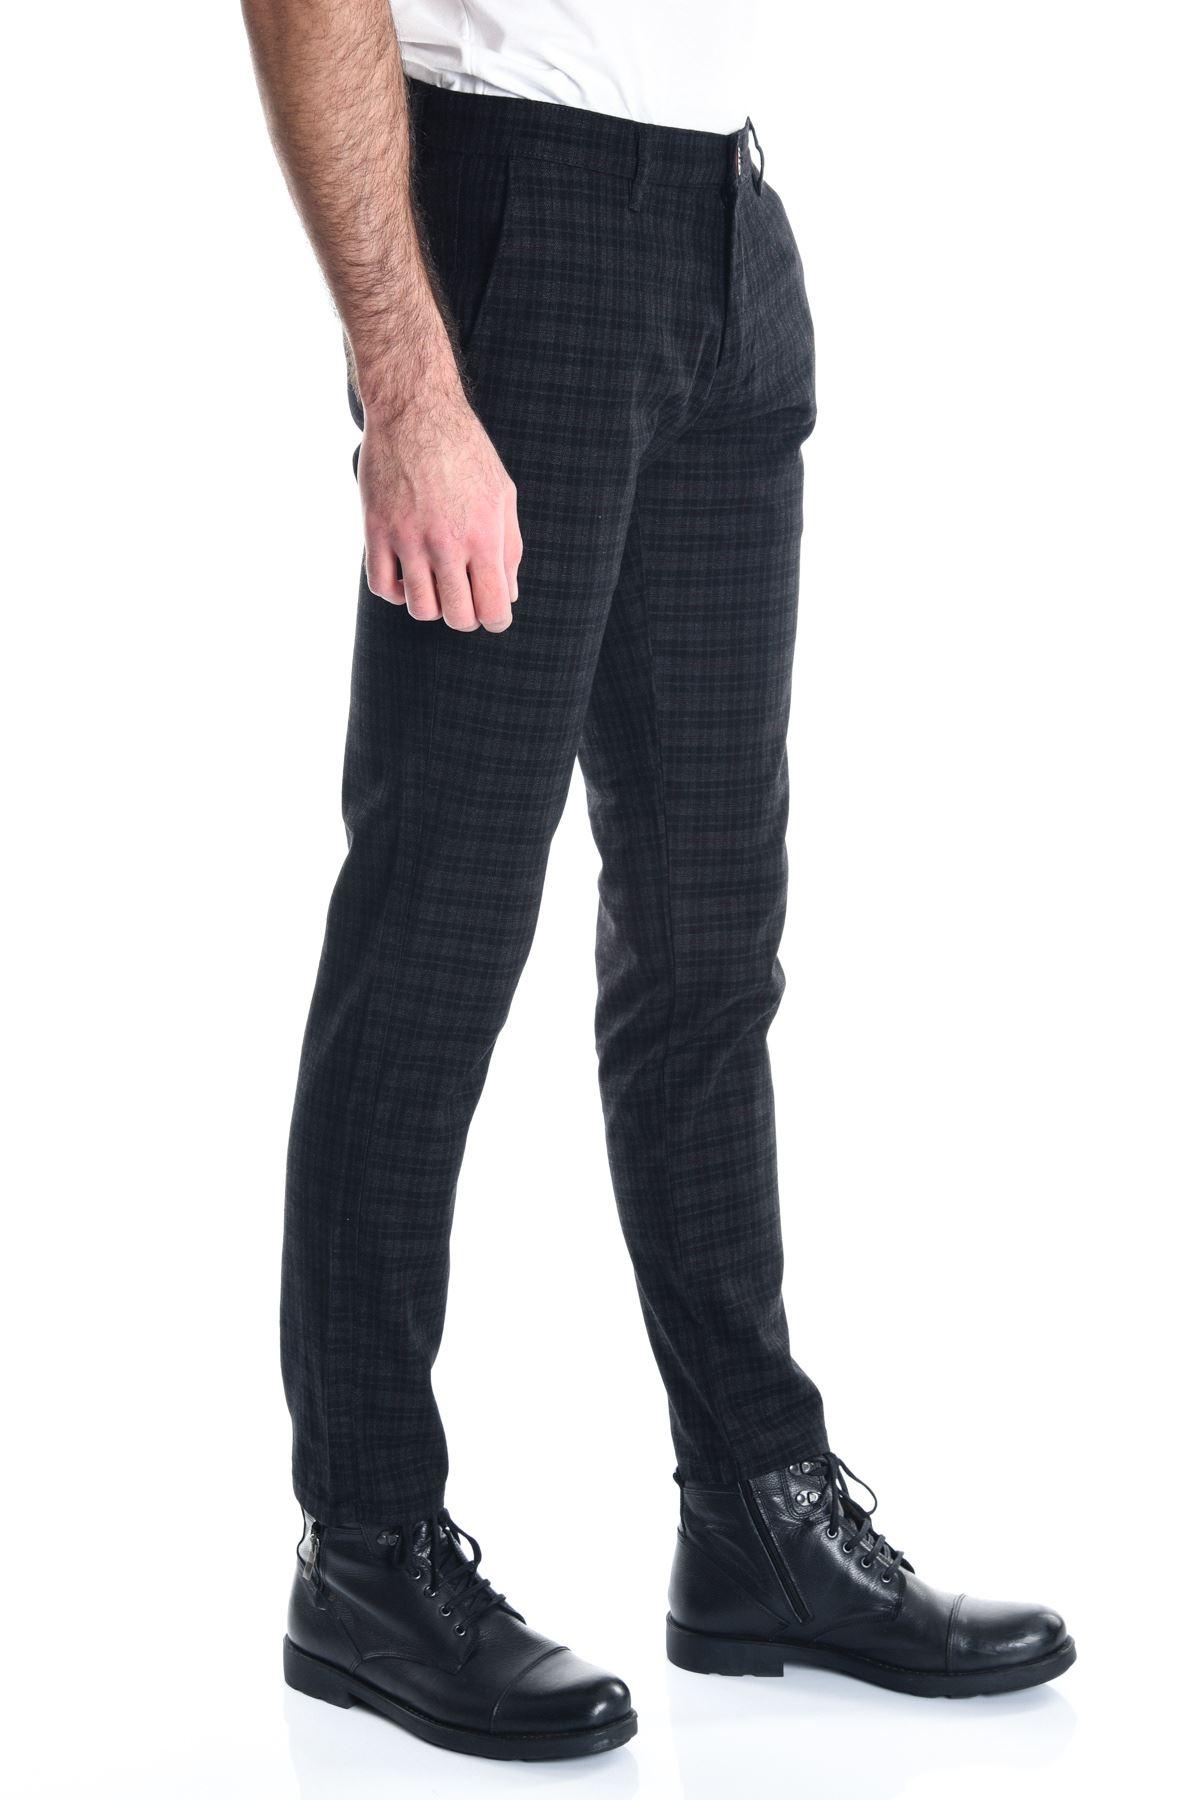 Siyah Ekose Slimfit Chino Erkek Pantolon